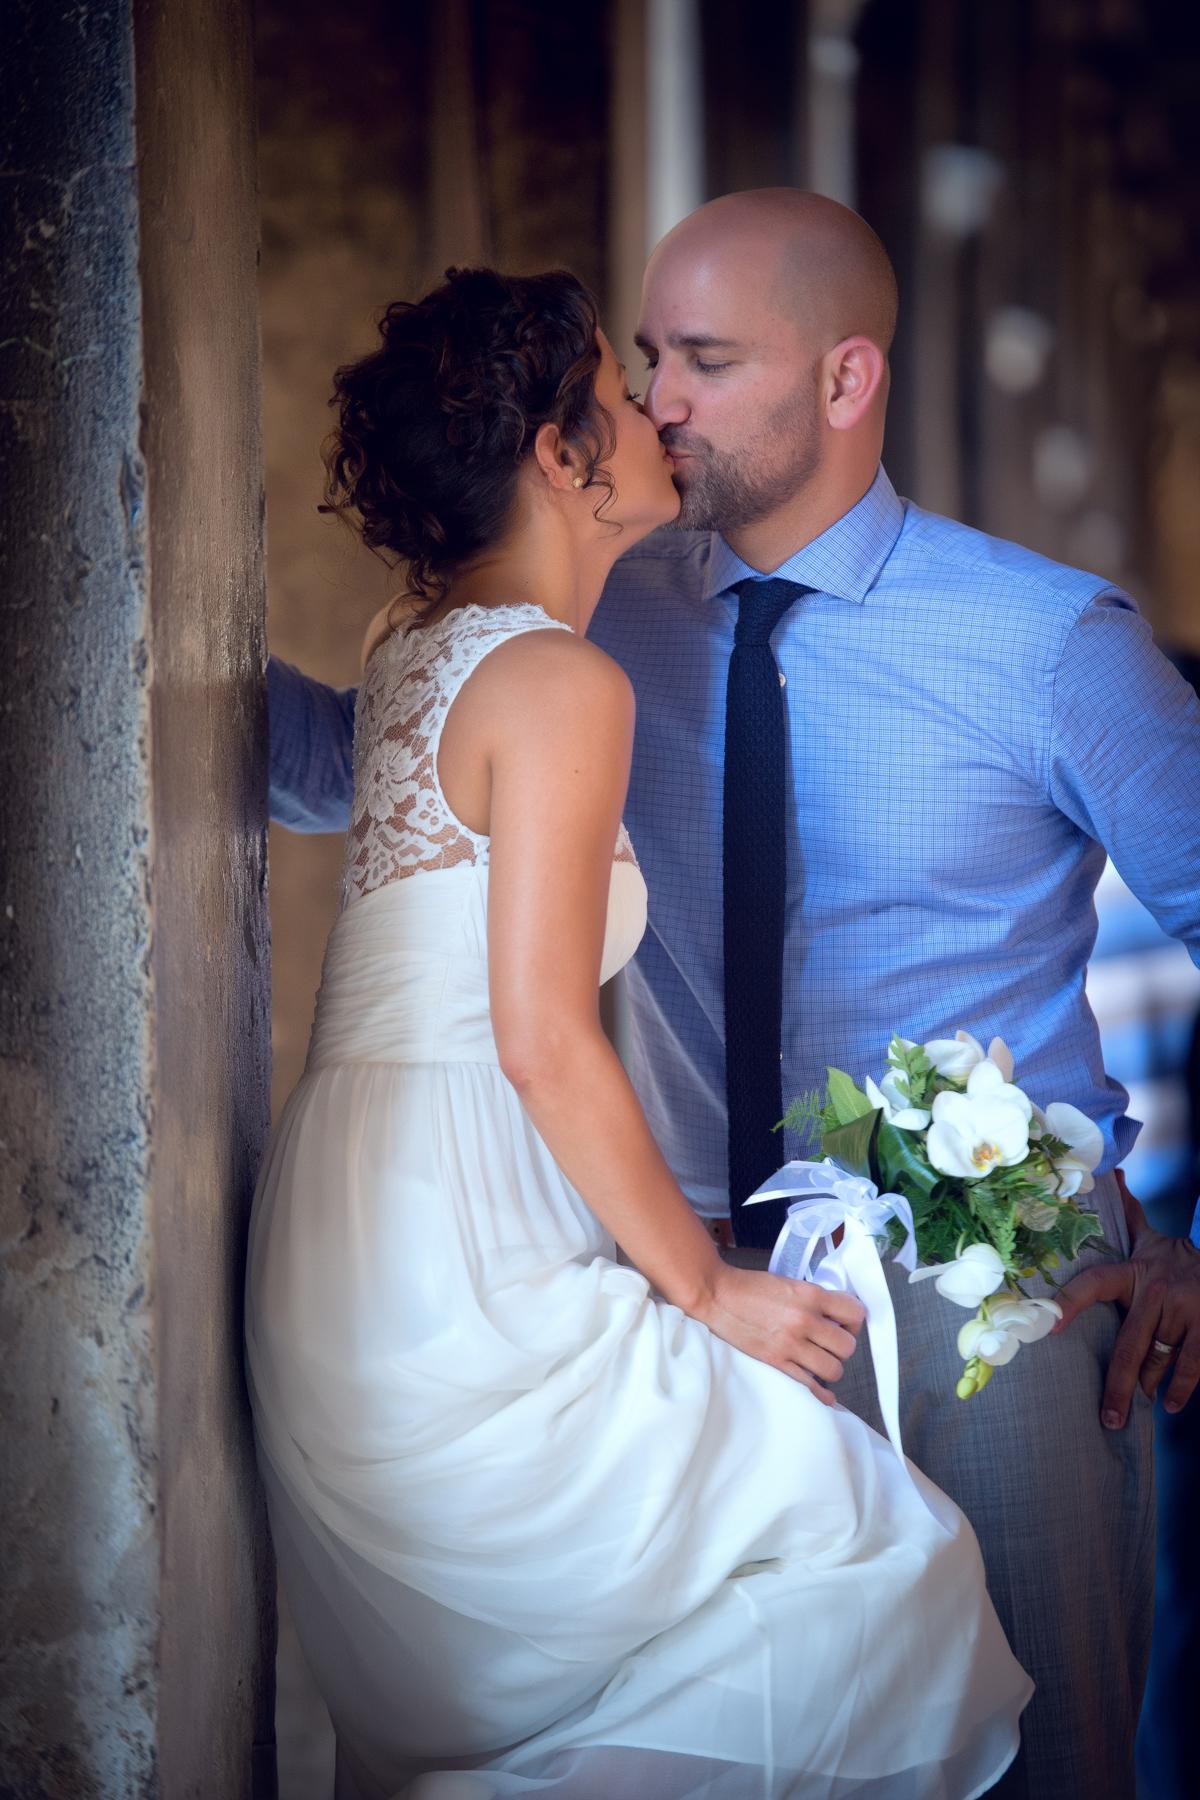 mariage venise photographe palazzo cavalli venice wedding photographer (206).jpg